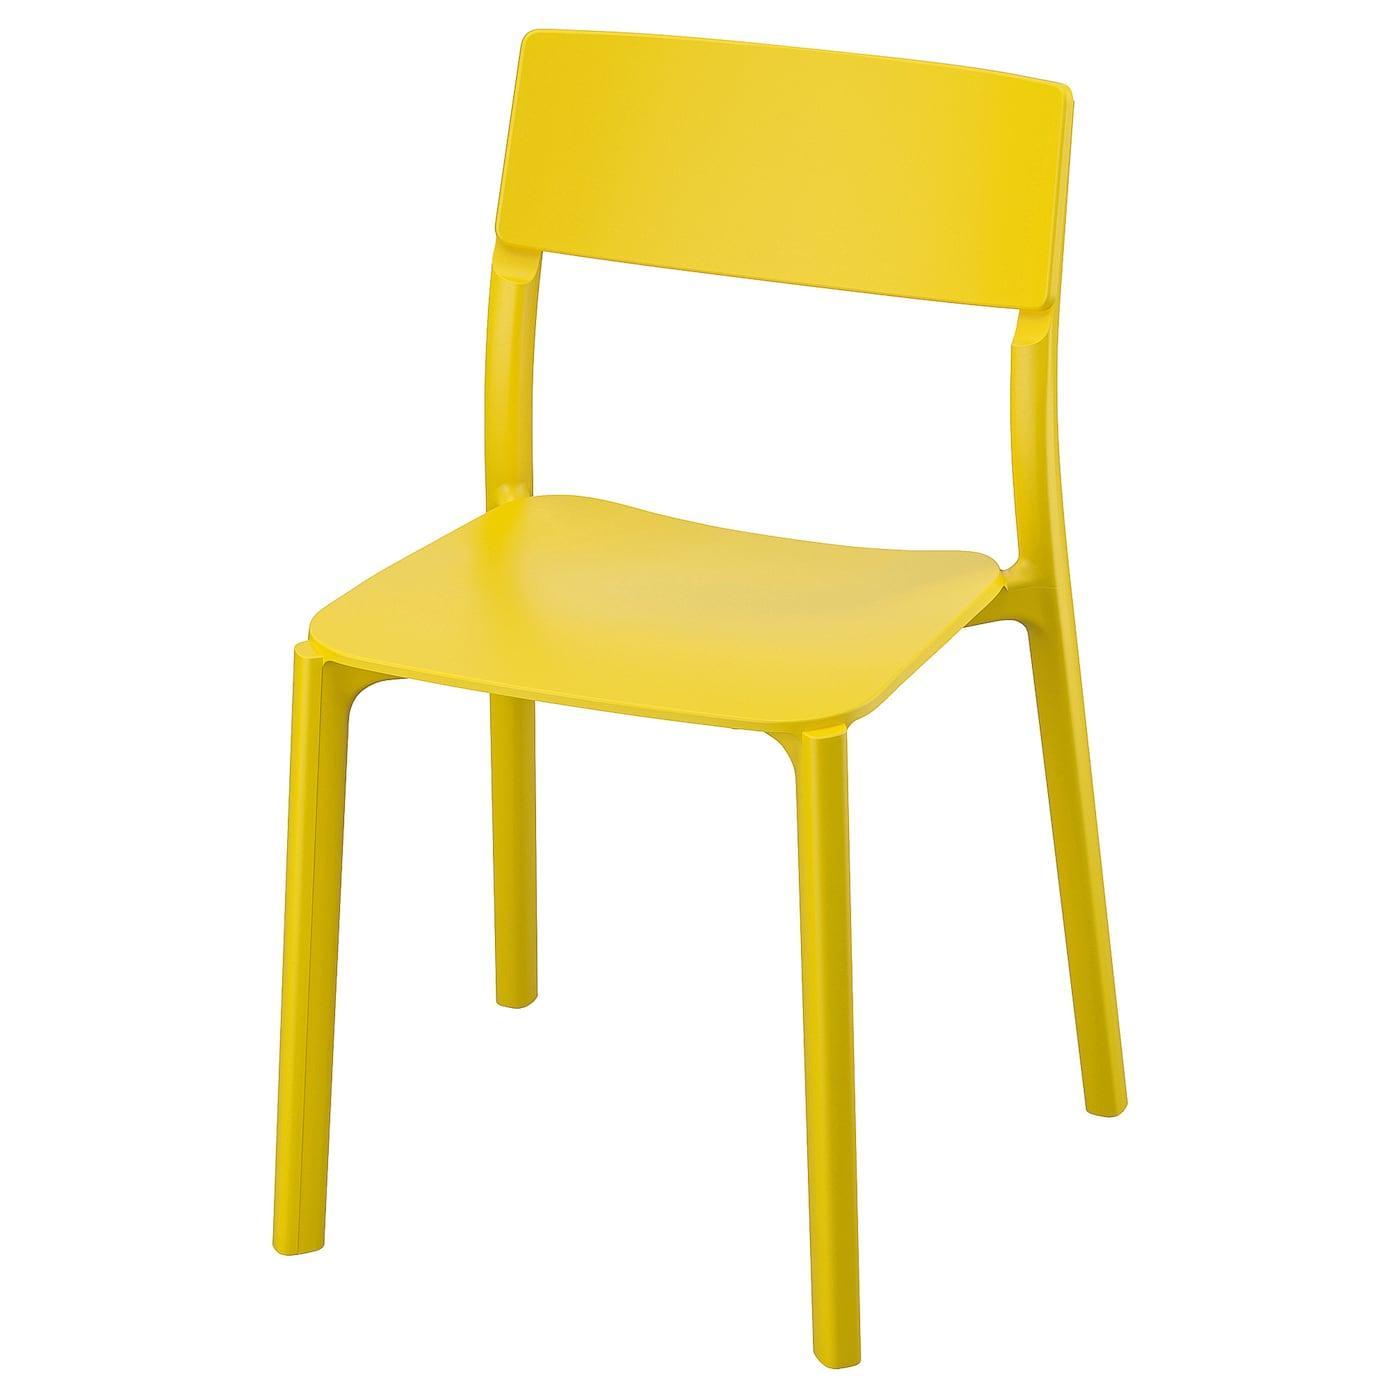 Ikea Stühle Gelb